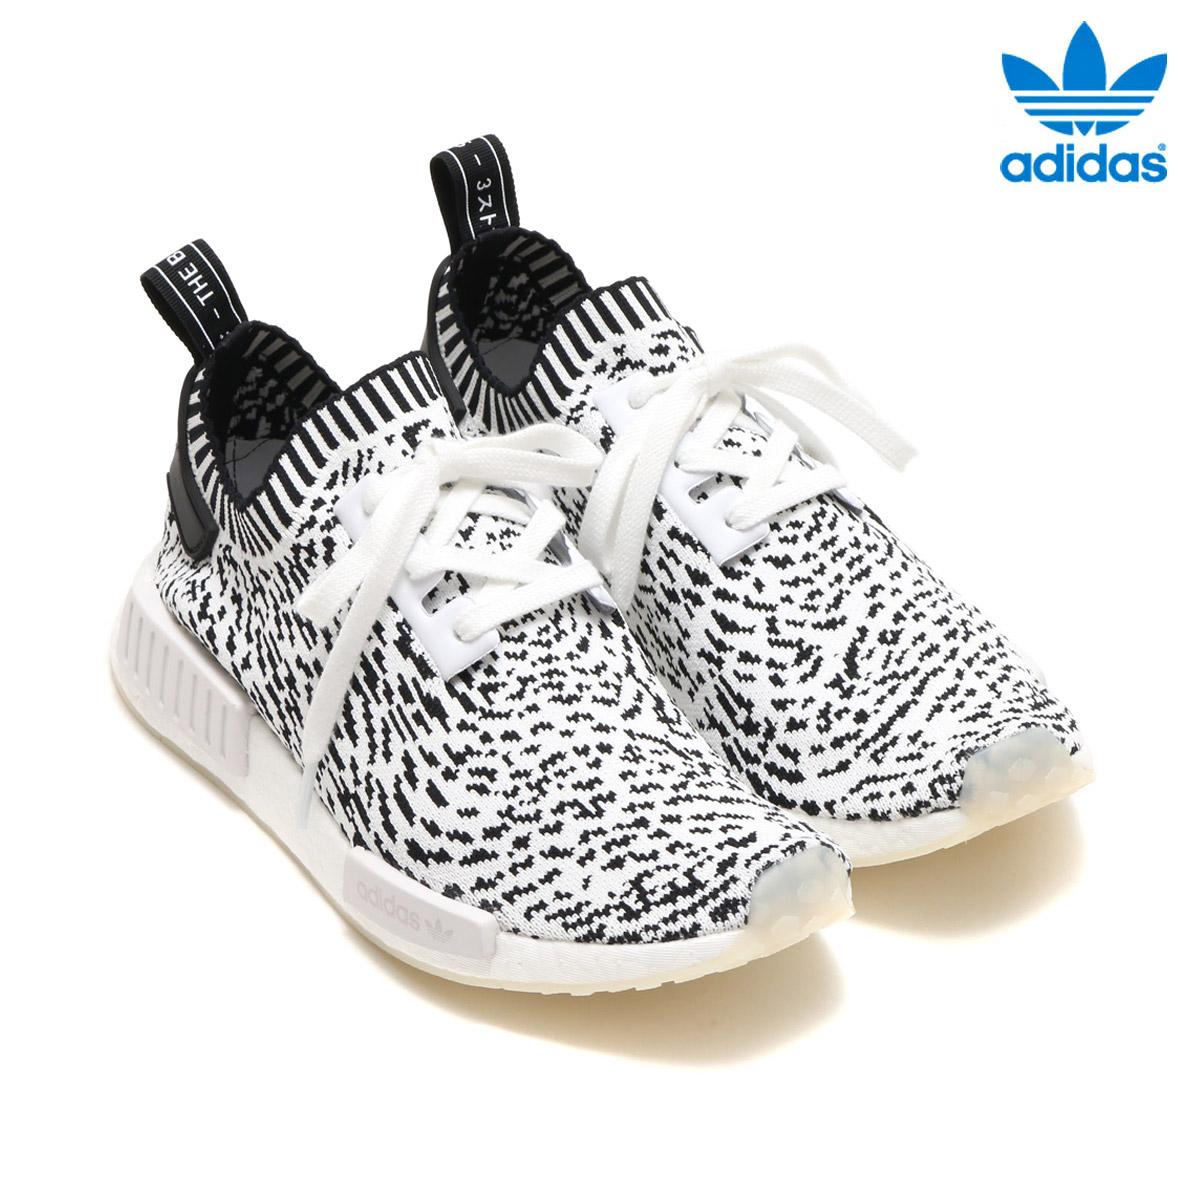 adidas Originals NMD_R1 PK(アディダス オリジナルス NMD_R1 PK) RUNNING WHITE/RUNNING WHITE/CORE BLACK【メンズ スニーカー】17FW-I